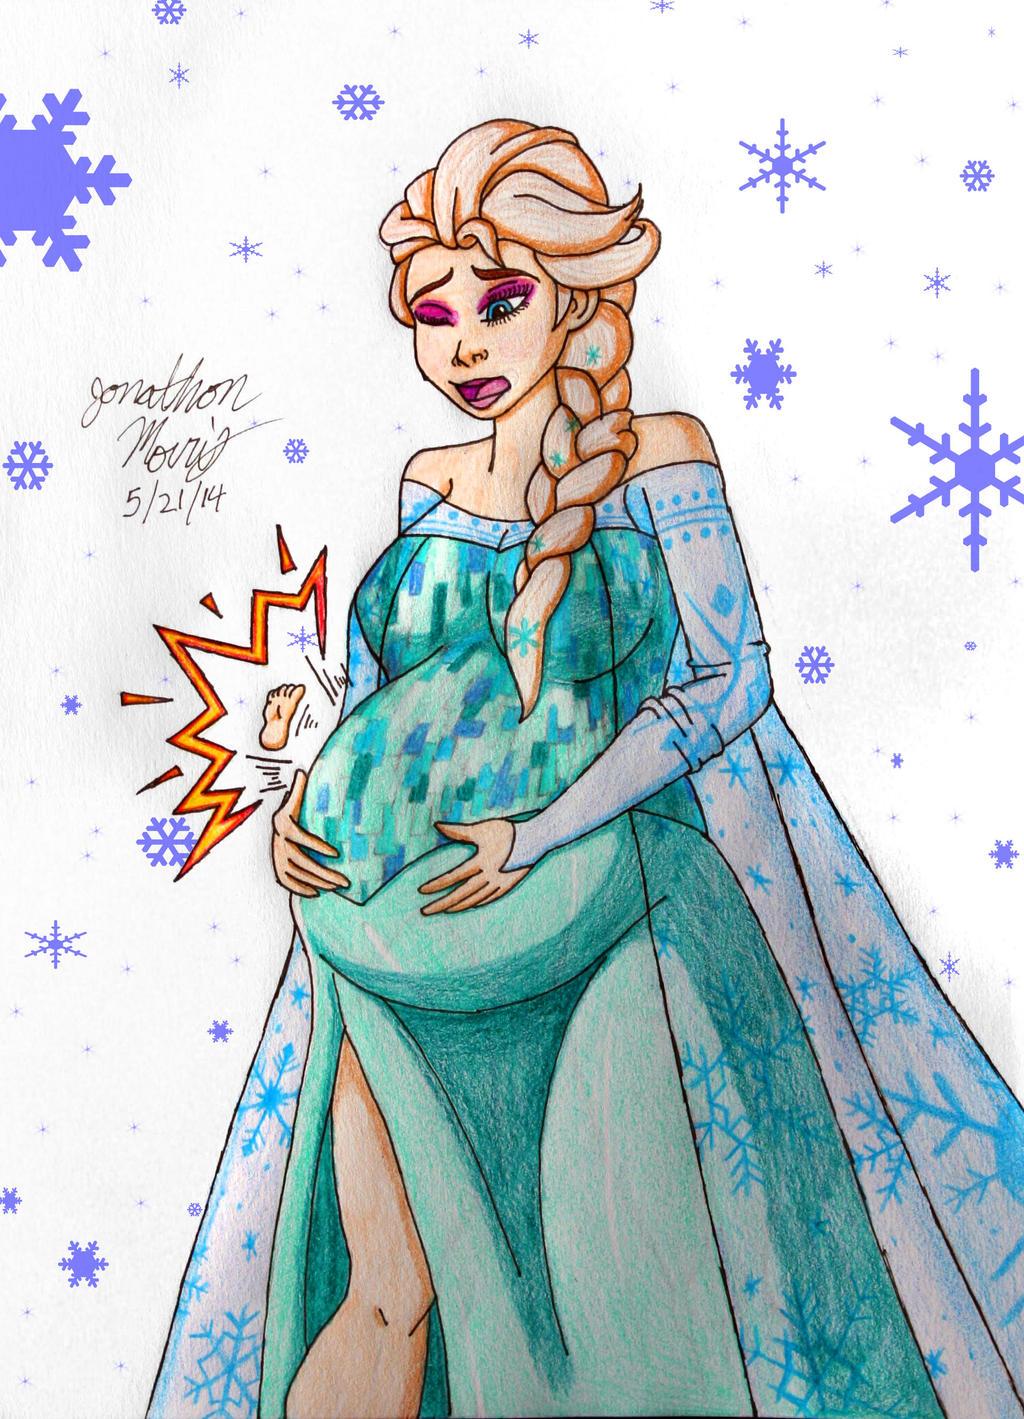 [Request] Pregnant Elsa by JAM4077 on DeviantArt